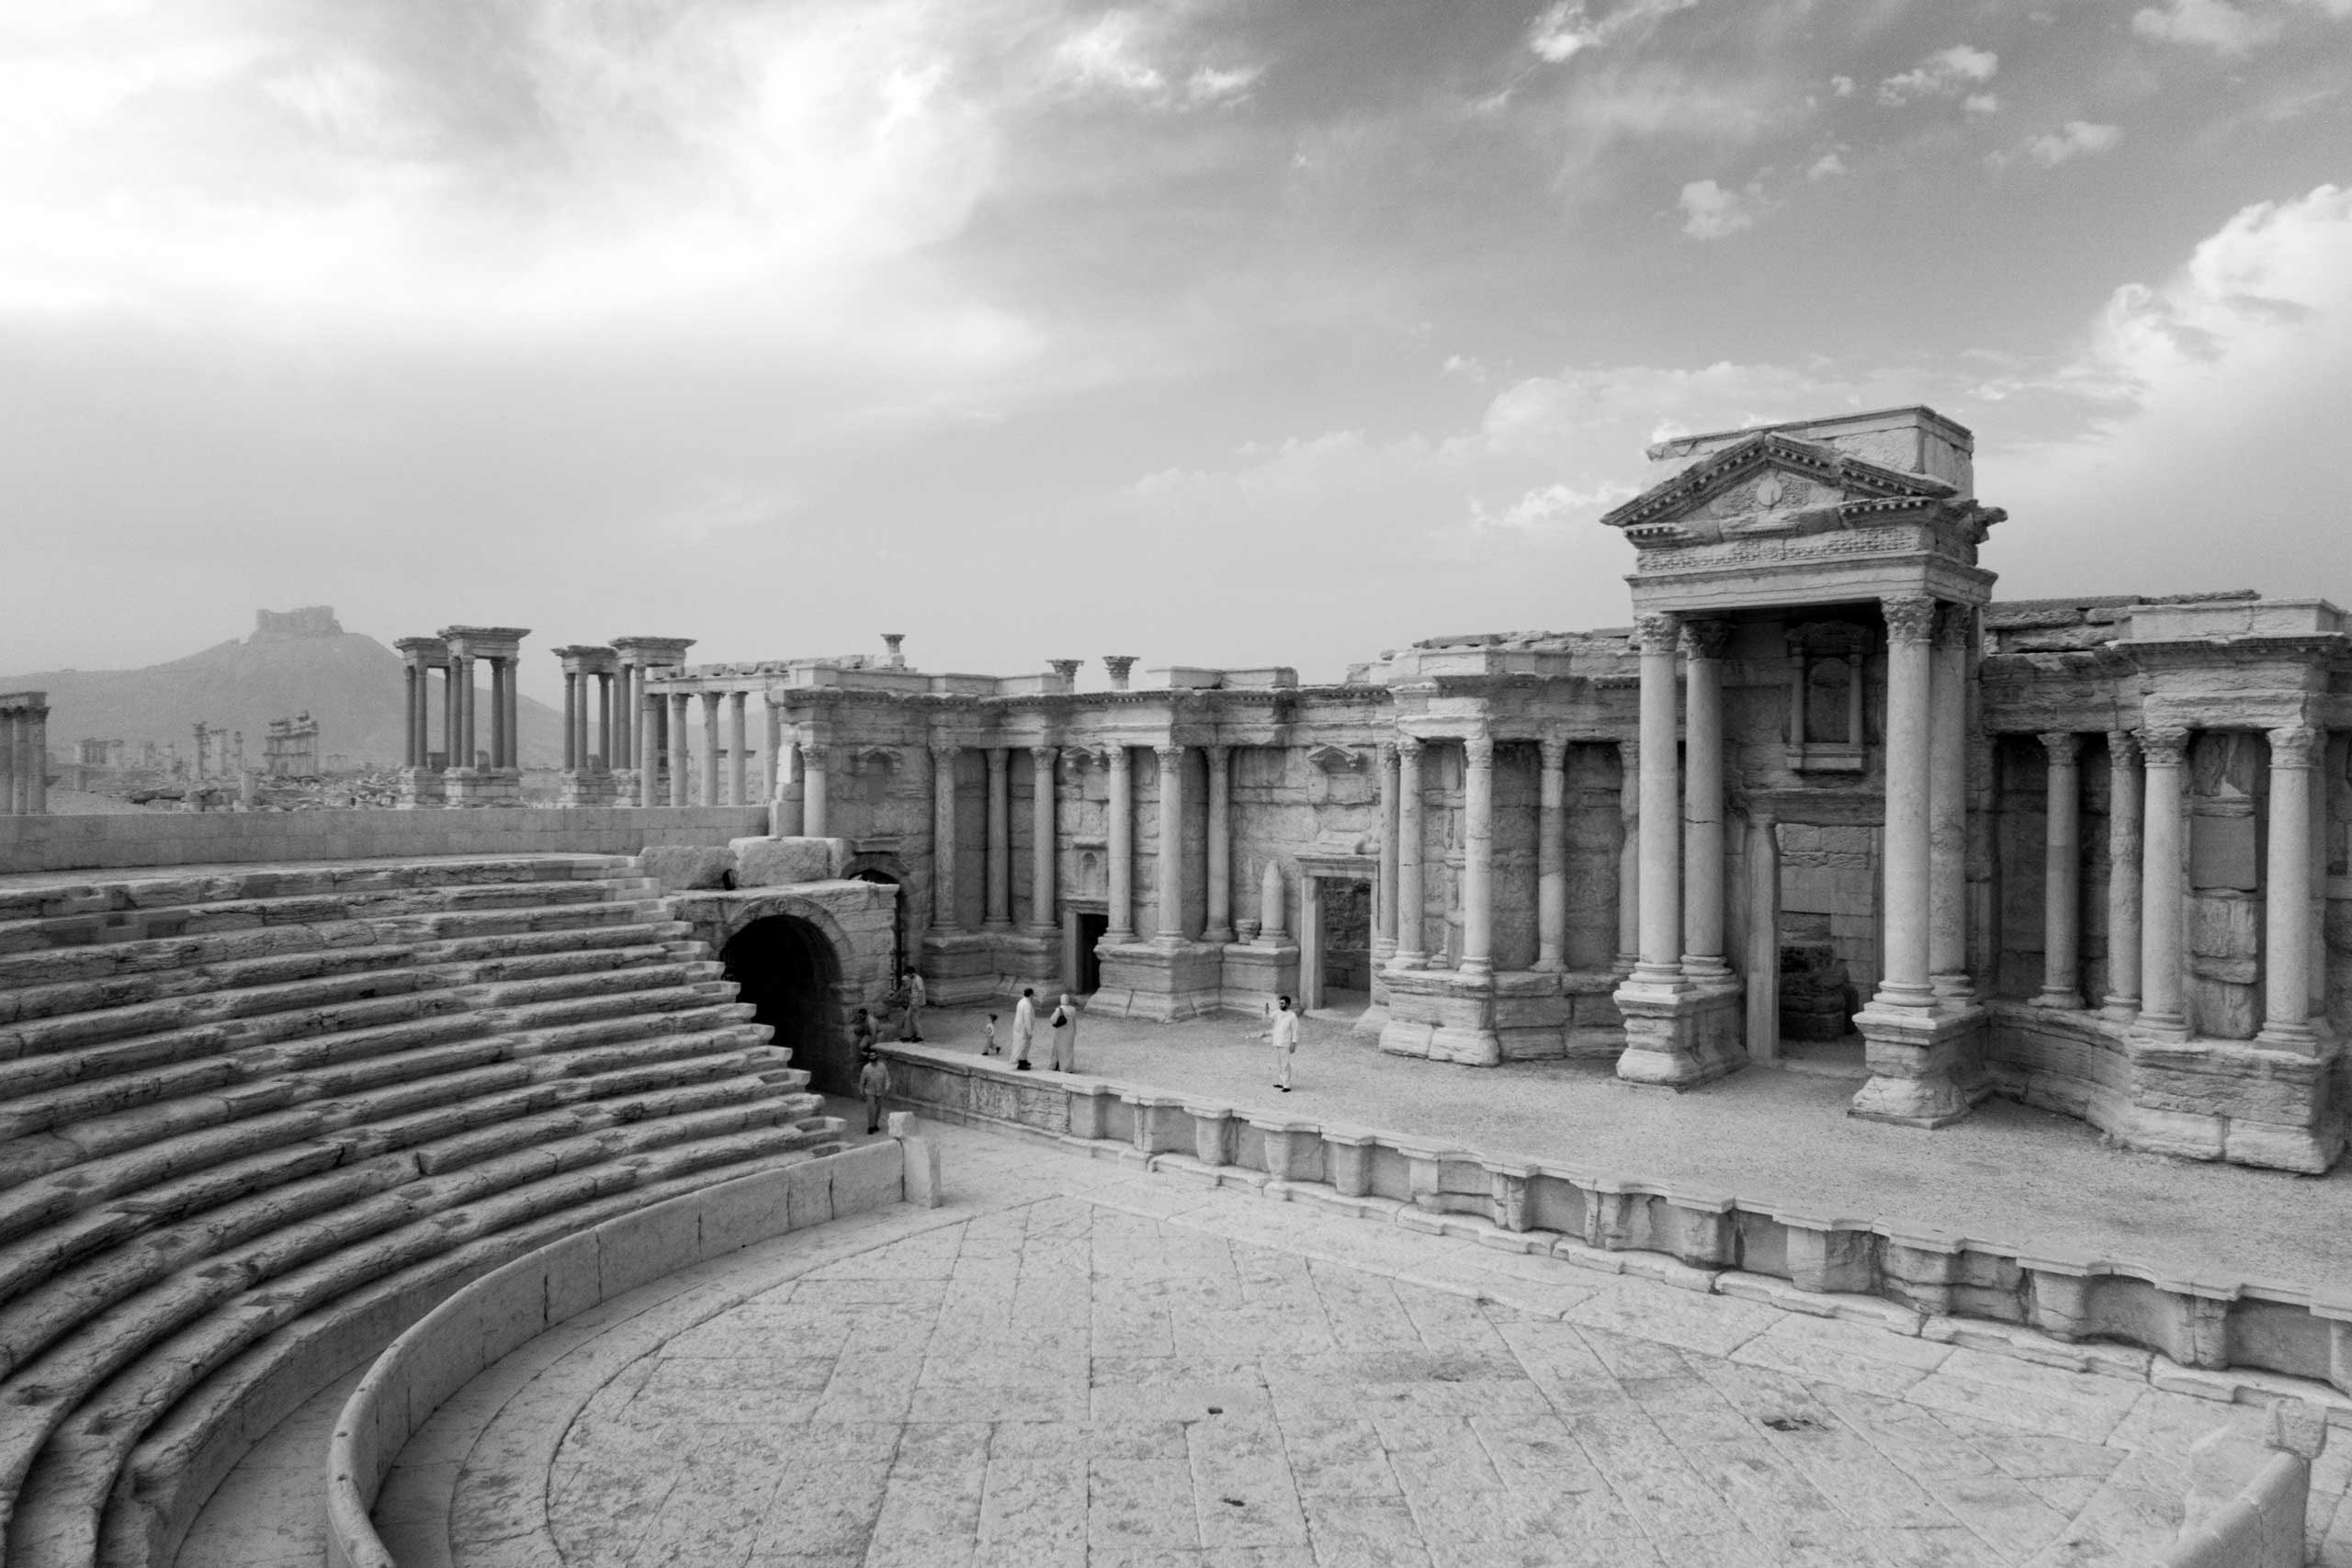 The grand Roman amphitheater in Palmyra.